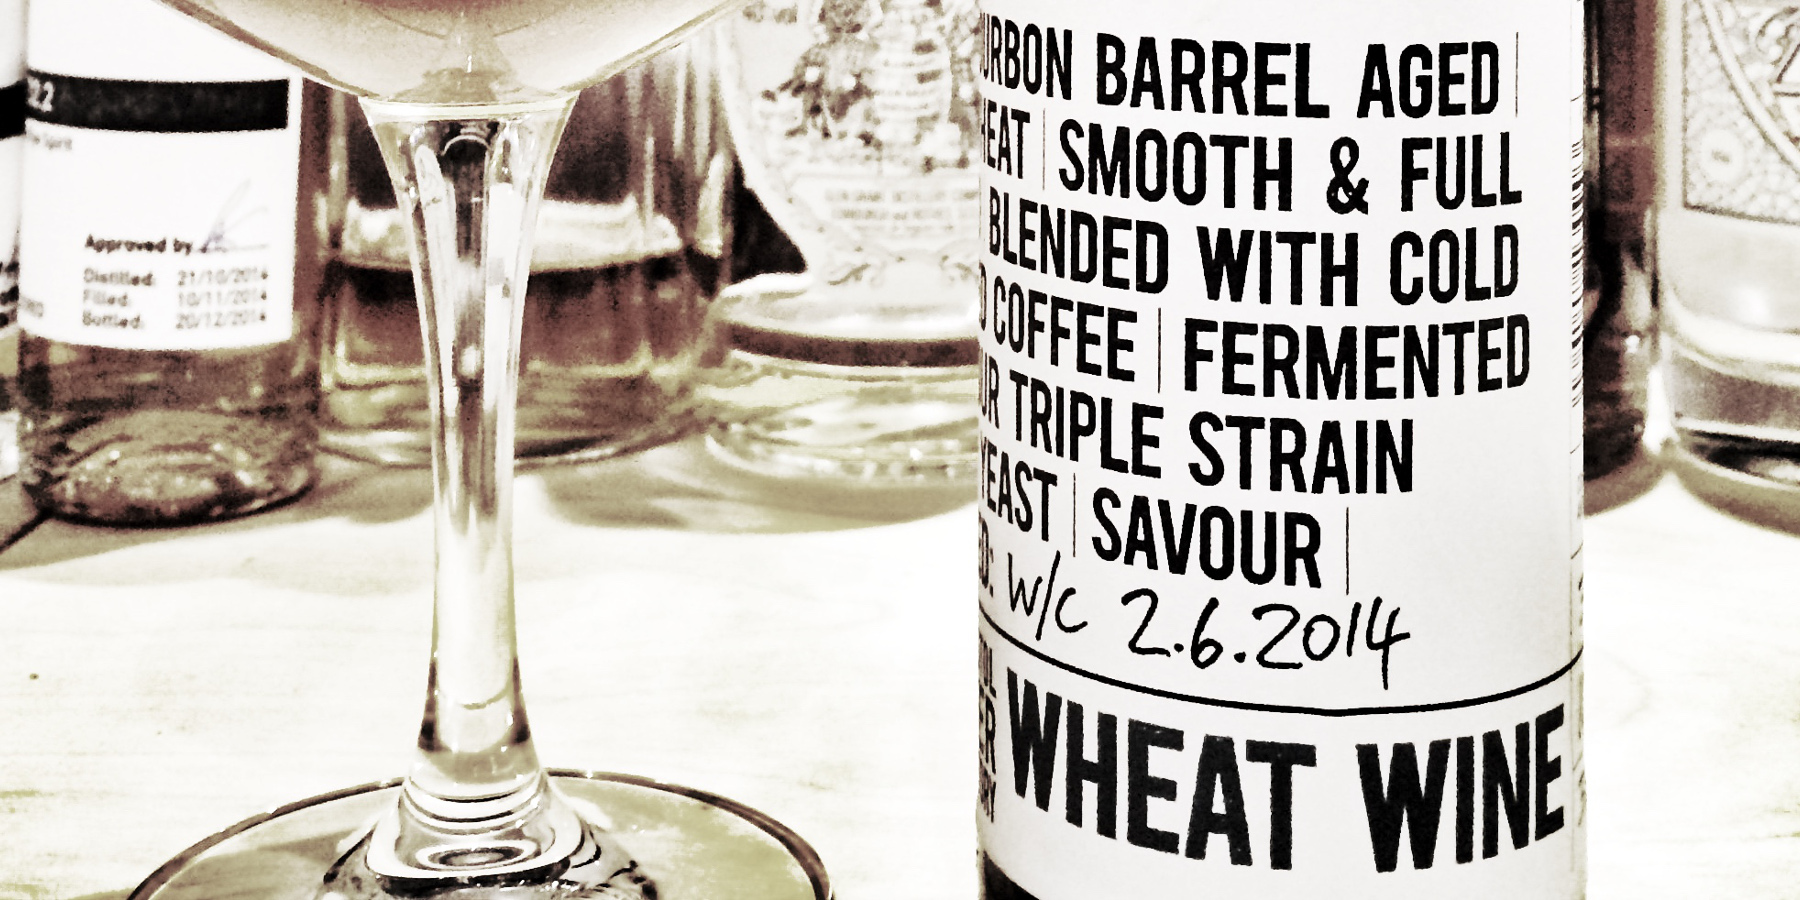 Bristol Beer Factory Wheat Wine